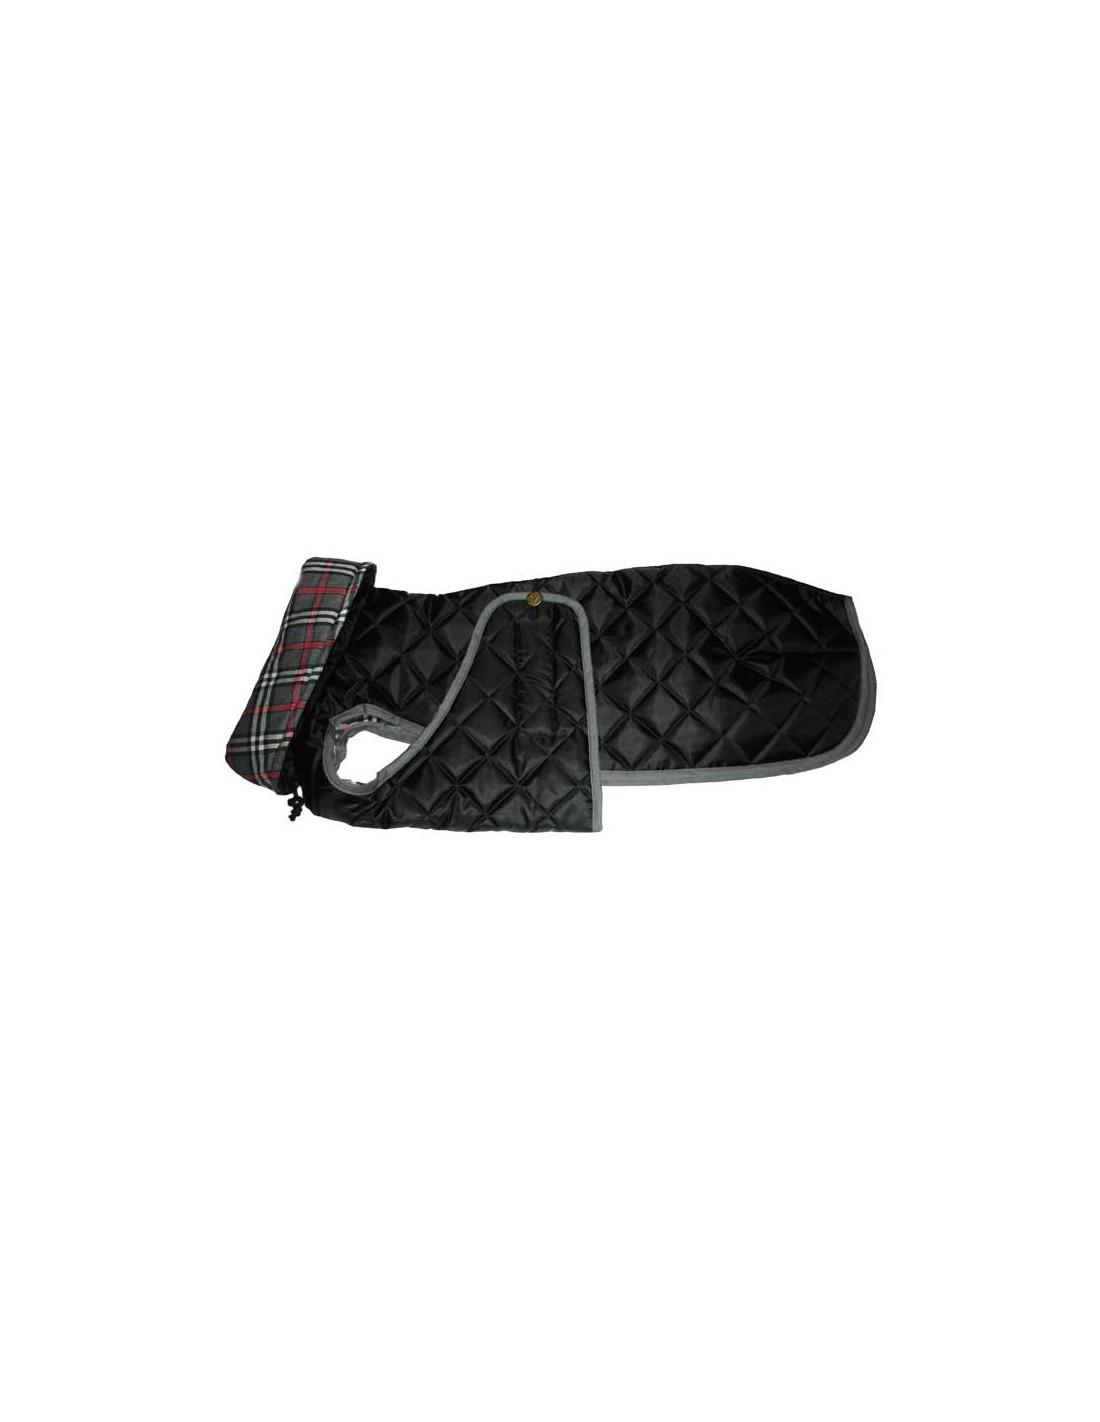 Ropa para perro - abrigo Impermeable Acolchado Galgo color negro